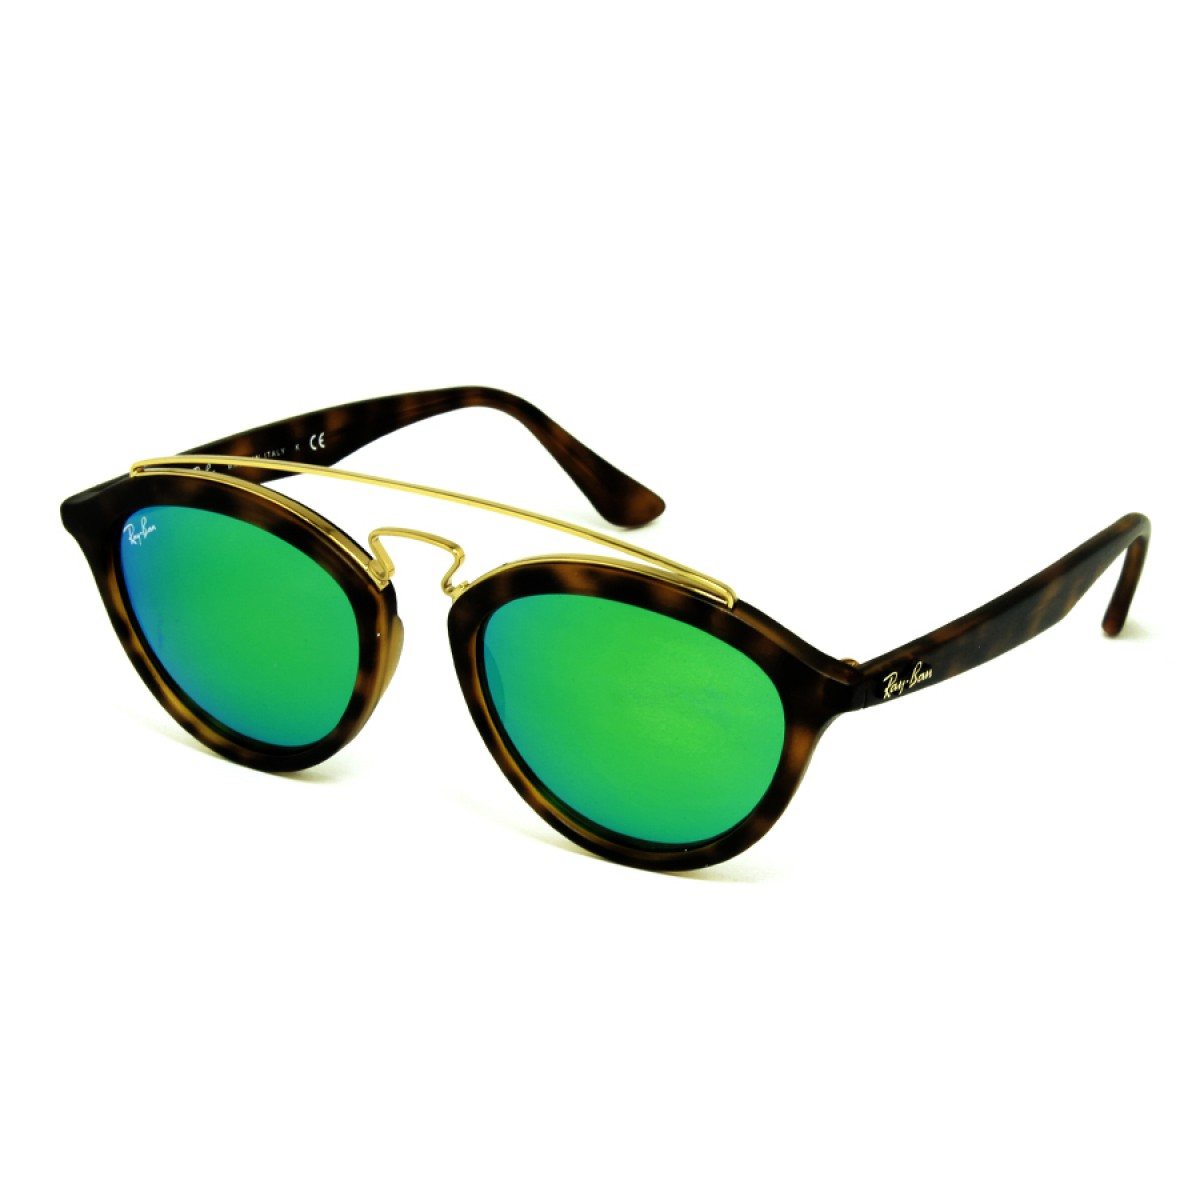 99a180d07e Ray Ban Gatsby II Green Mirror Unisex Sunglasses RB4257-60923R-50 -  Sunglasses - Fashion World